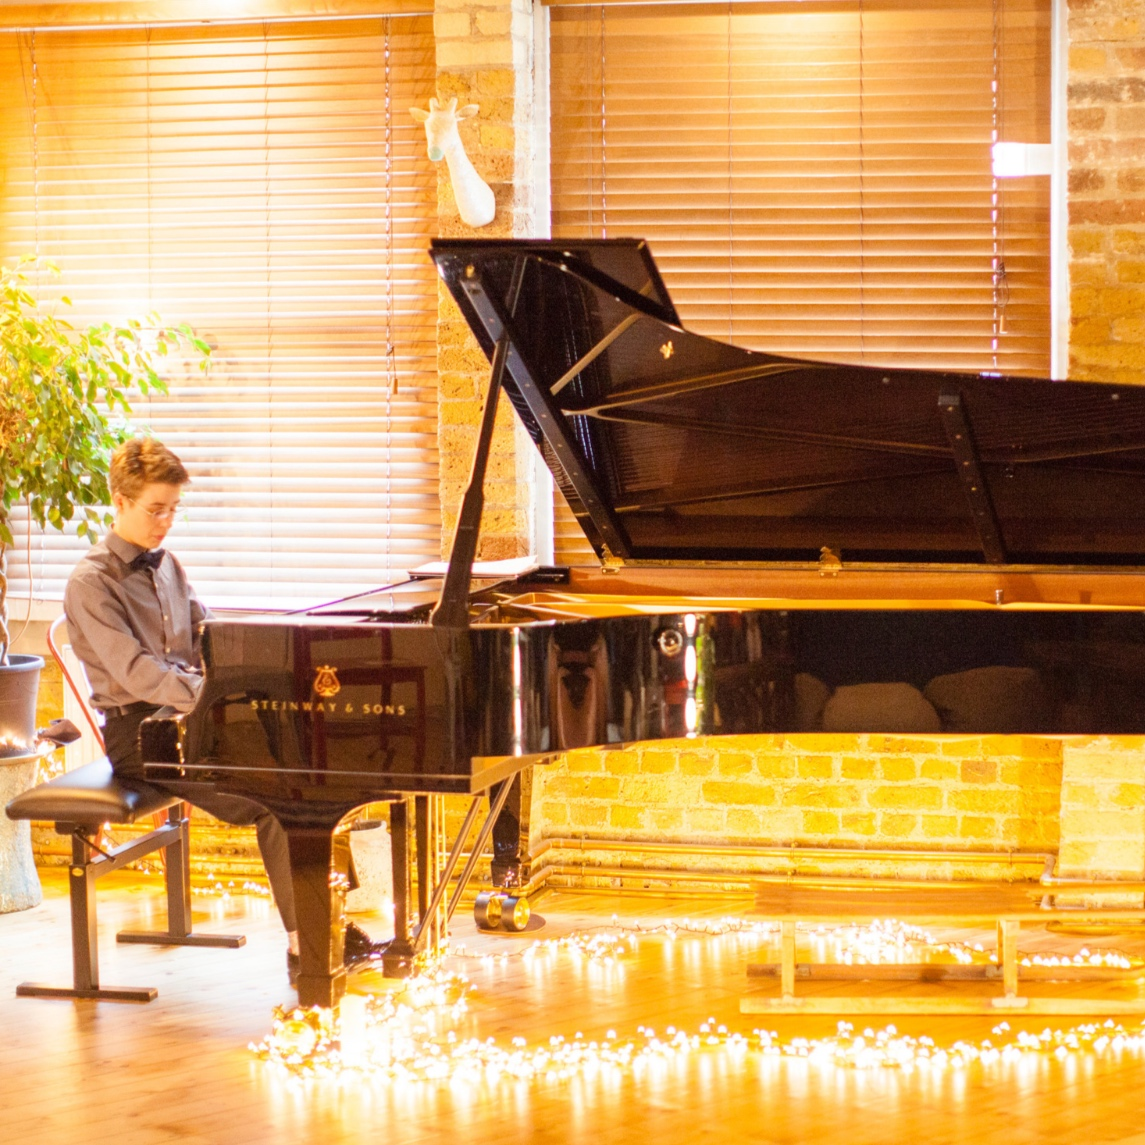 Pianist: Jazz, Improv on Popular Tunes, Classical